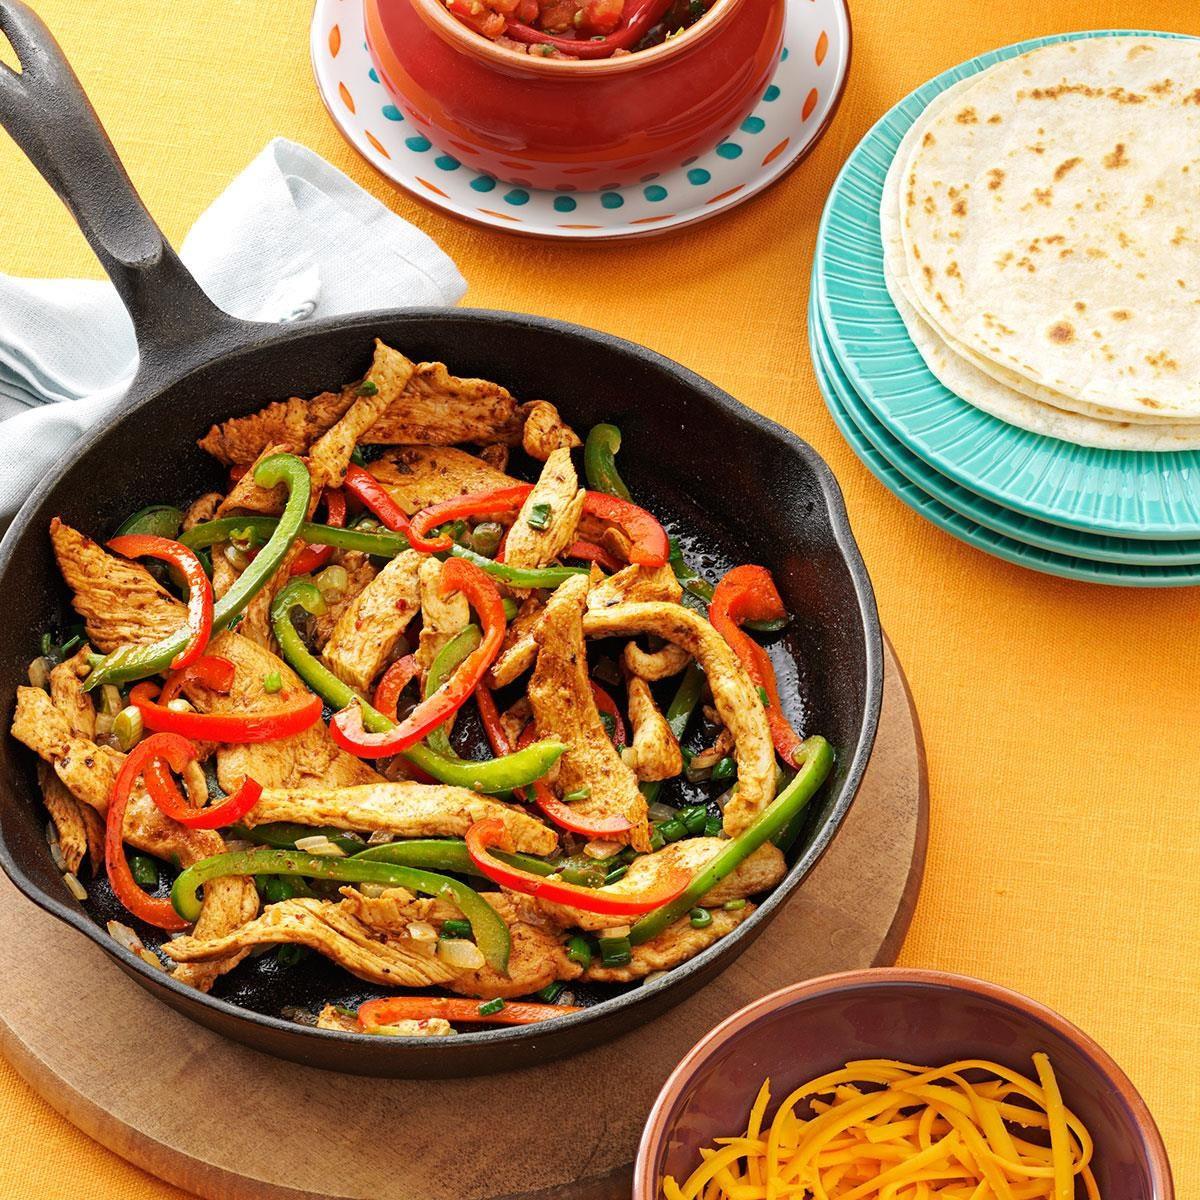 Best Quick Dinners  Top 10 Quick Dinner Ideas